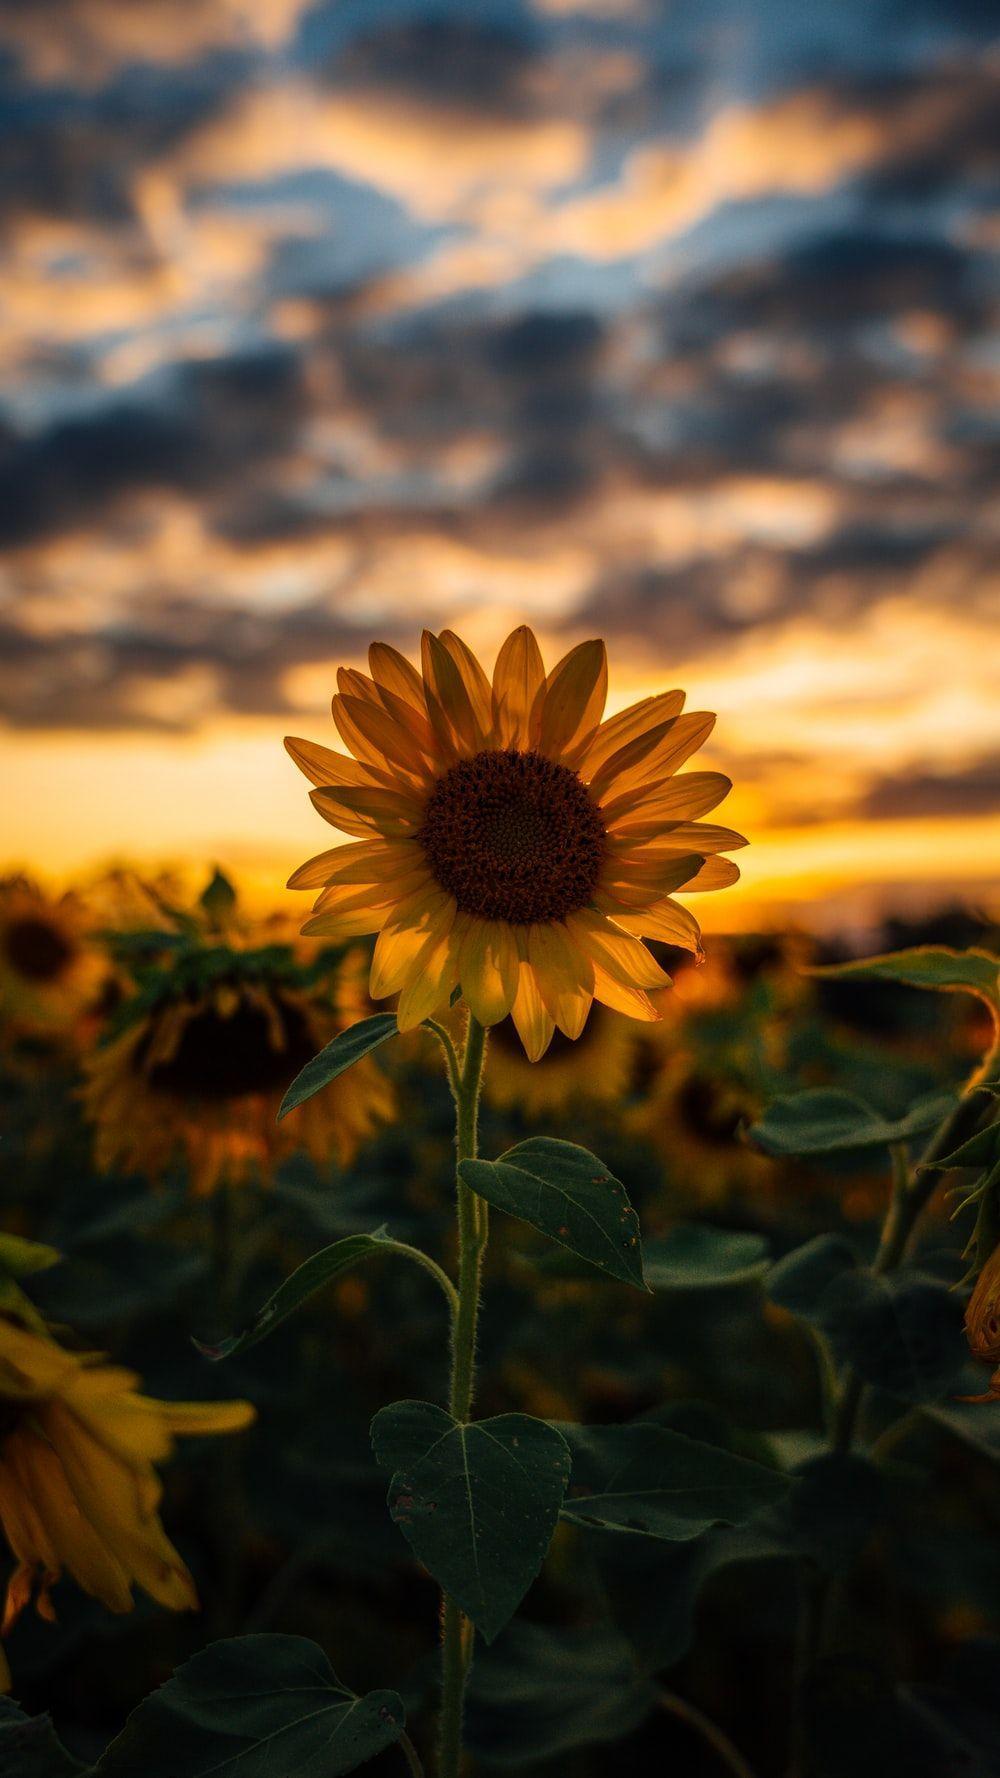 Cute Sunflower Wallpapers Top Free Cute Sunflower Backgrounds Wallpaperaccess